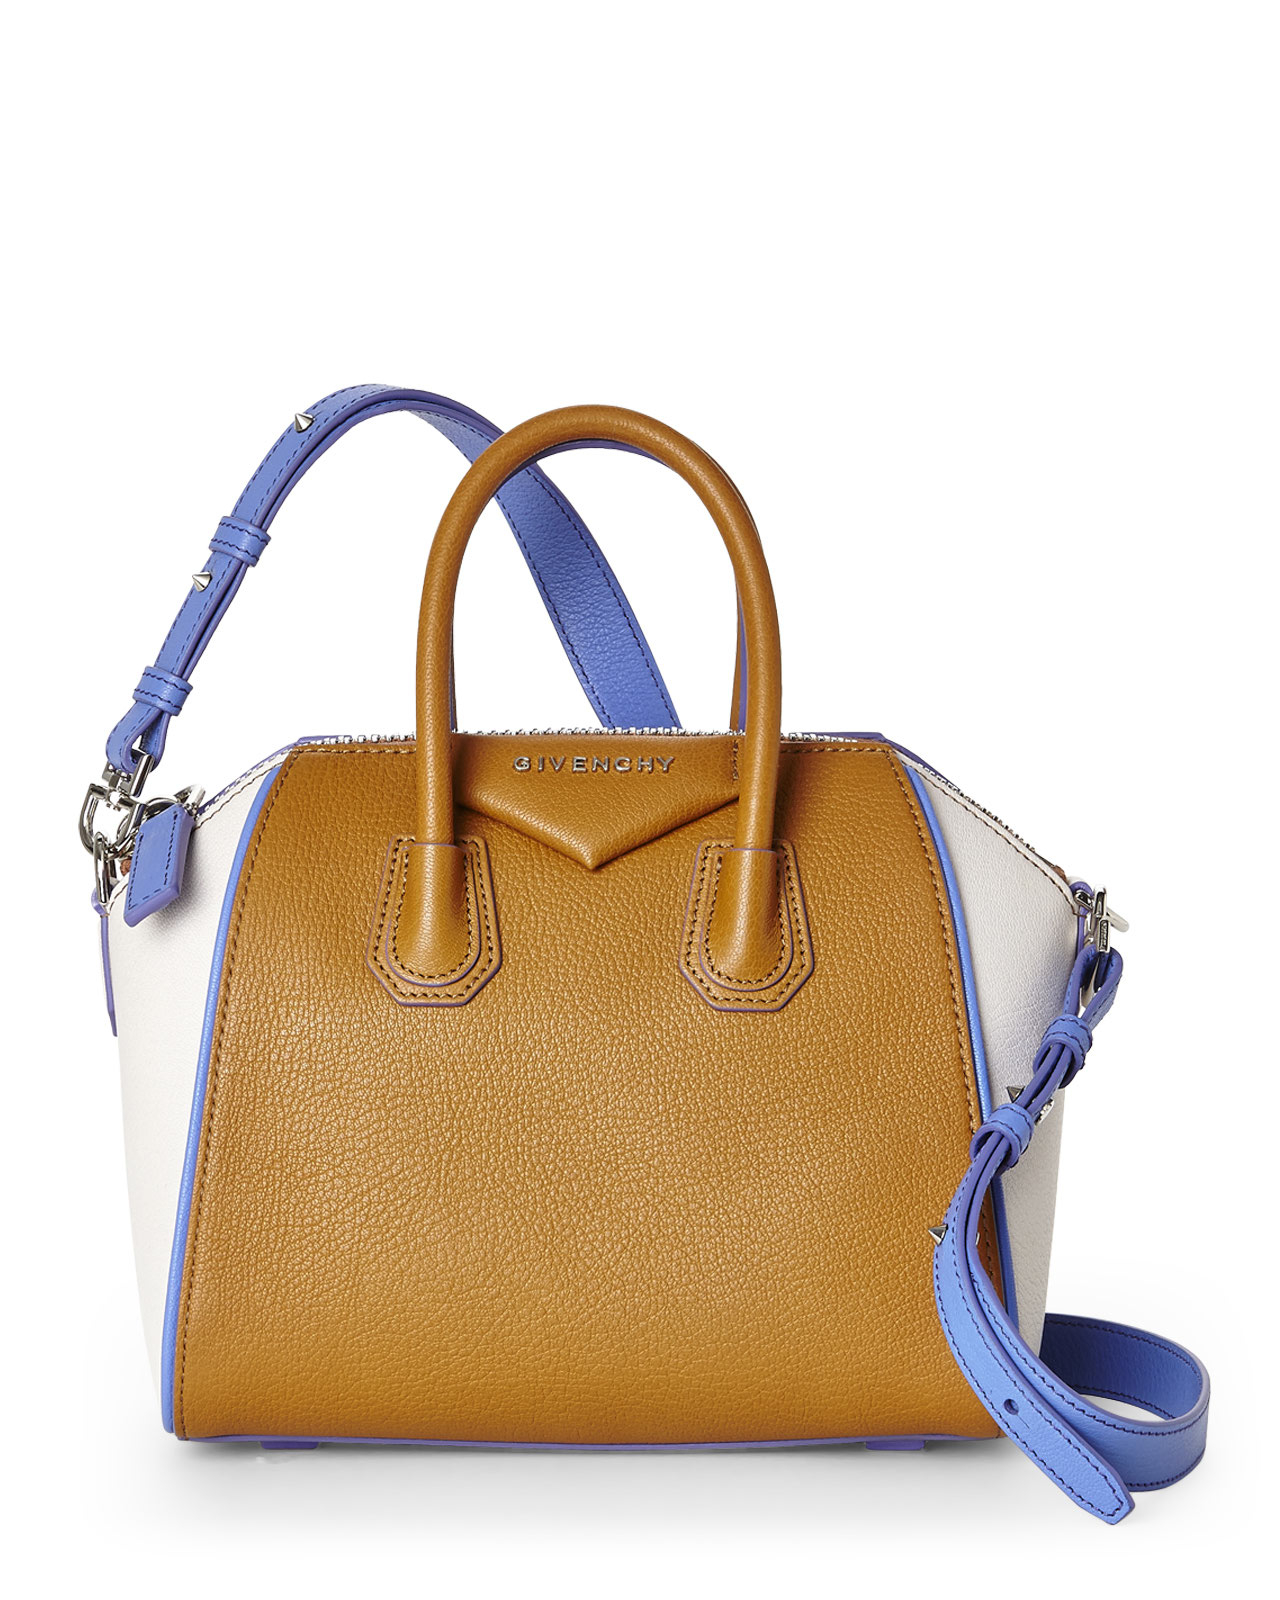 5fe1dcdafc Lyst - Givenchy Antigona Color Block Mini Satchel